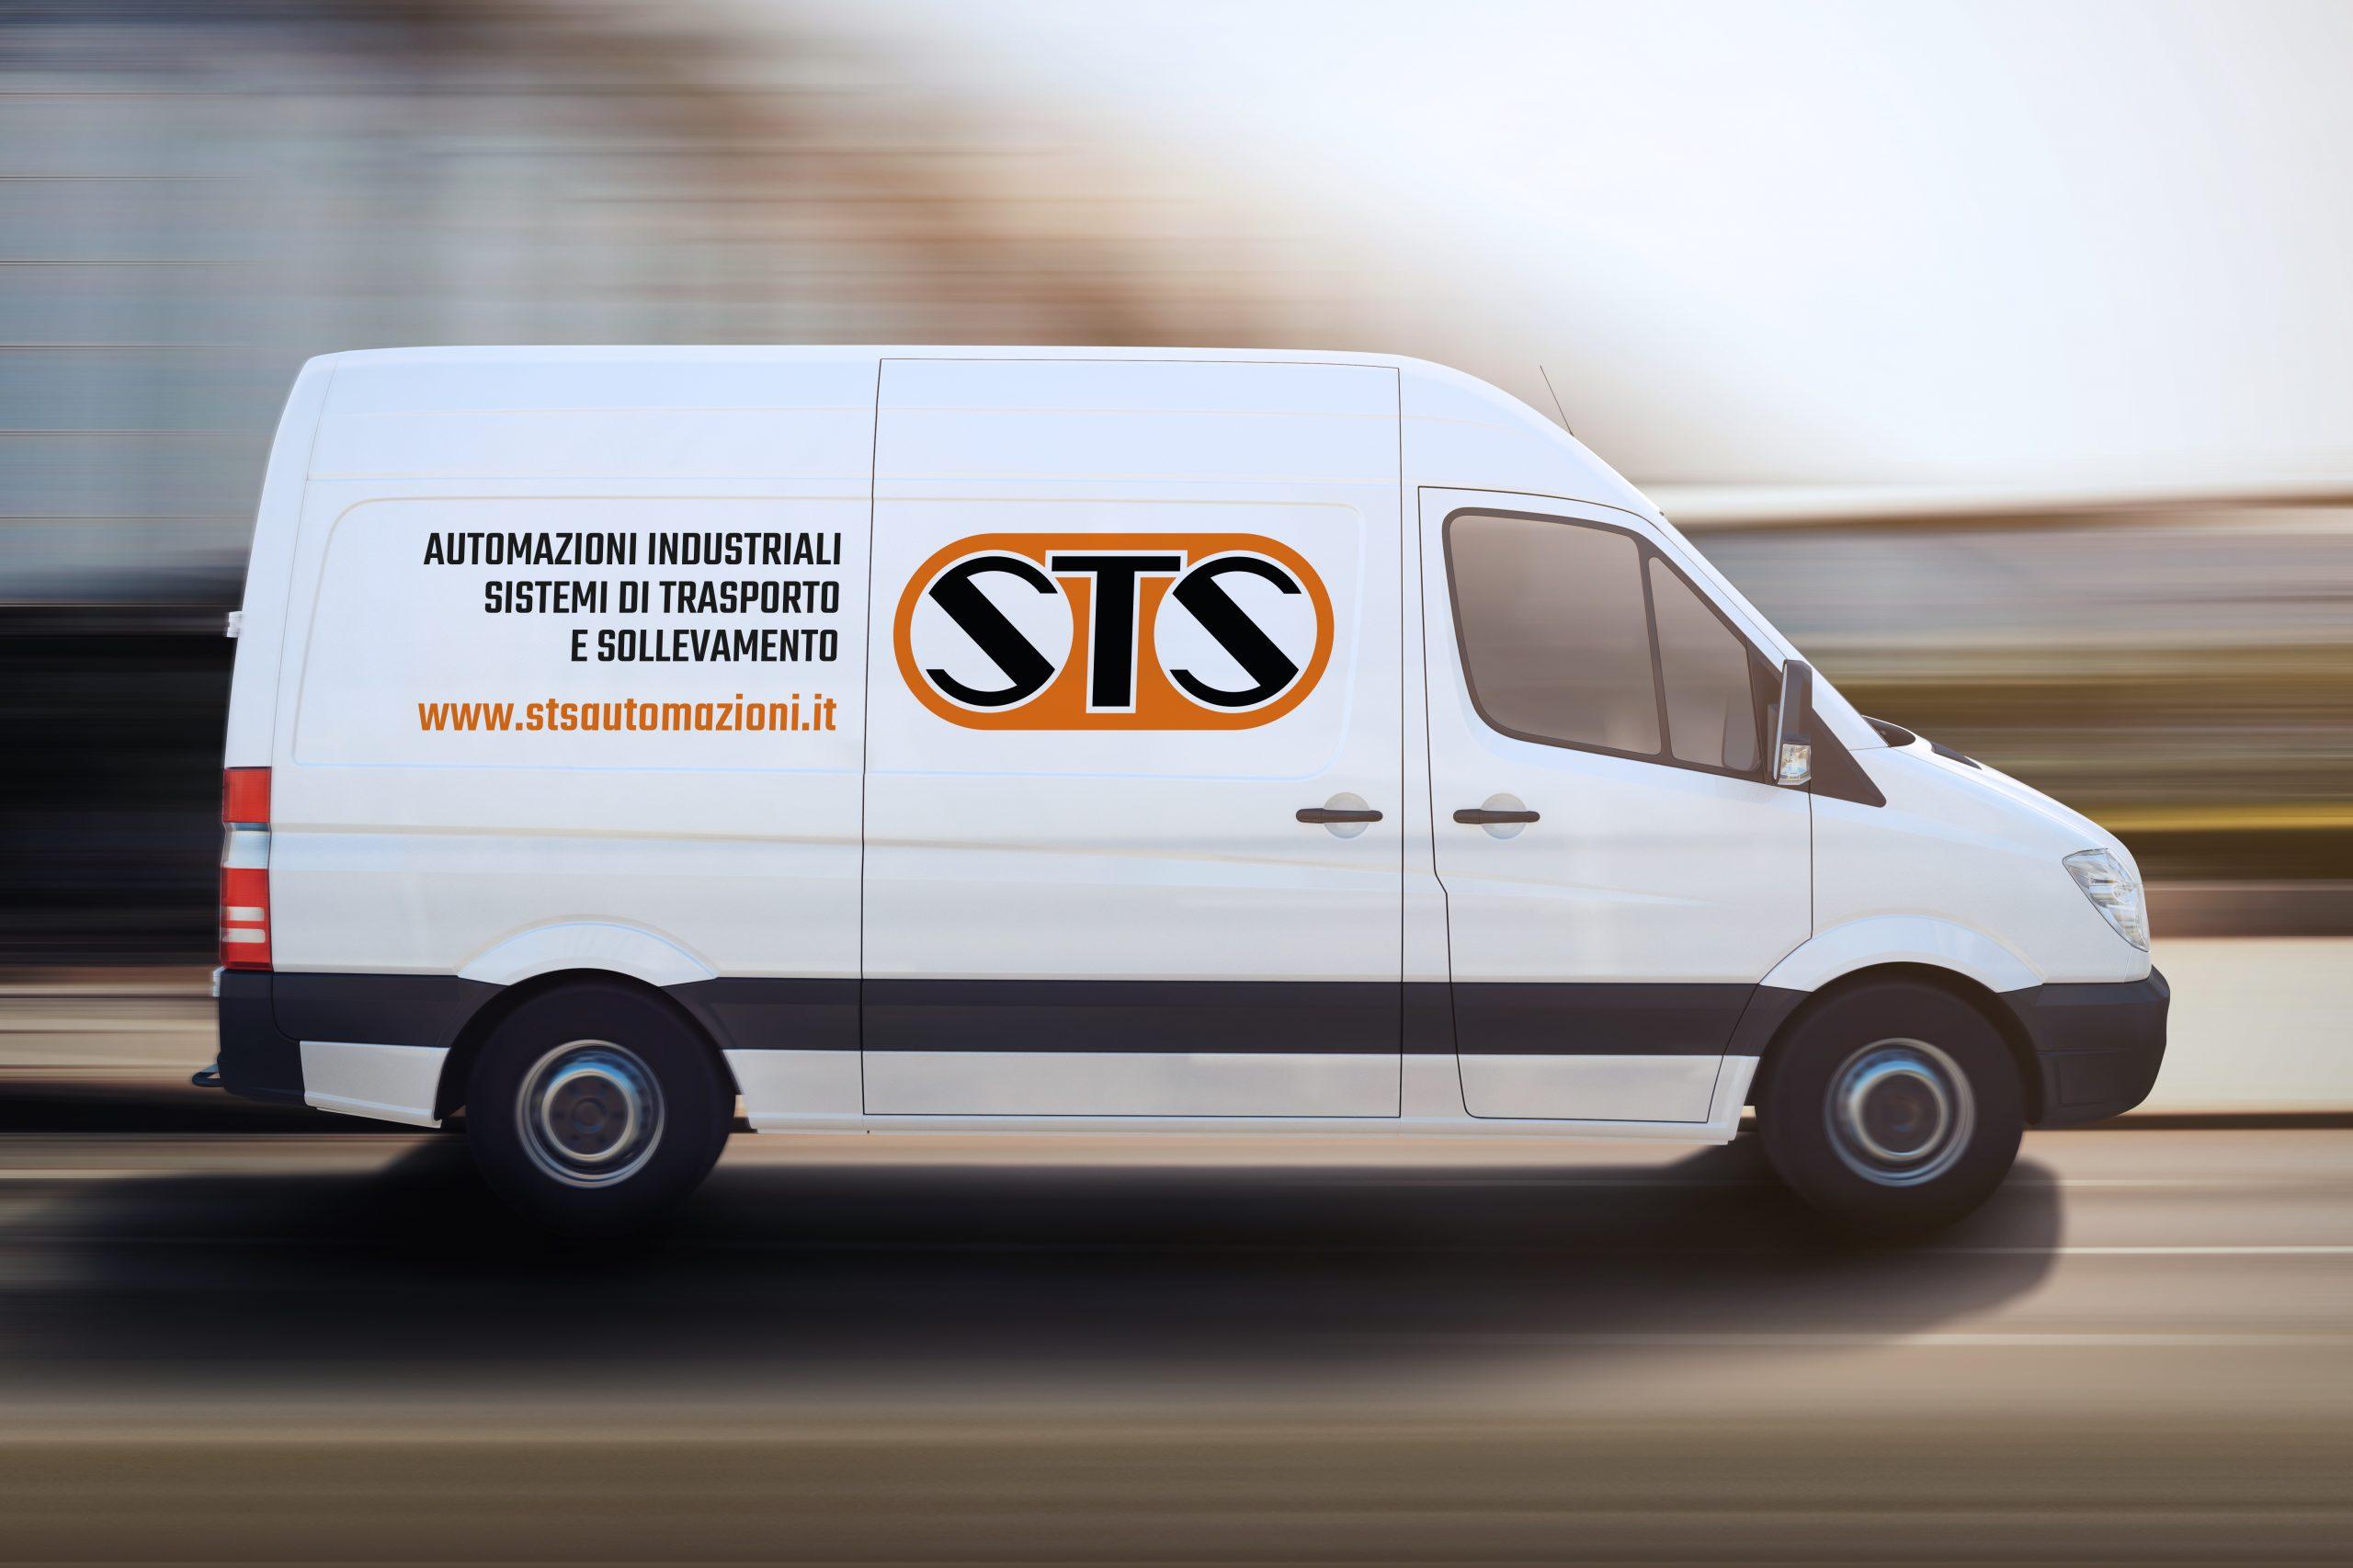 Furgone bianco con logo Sts